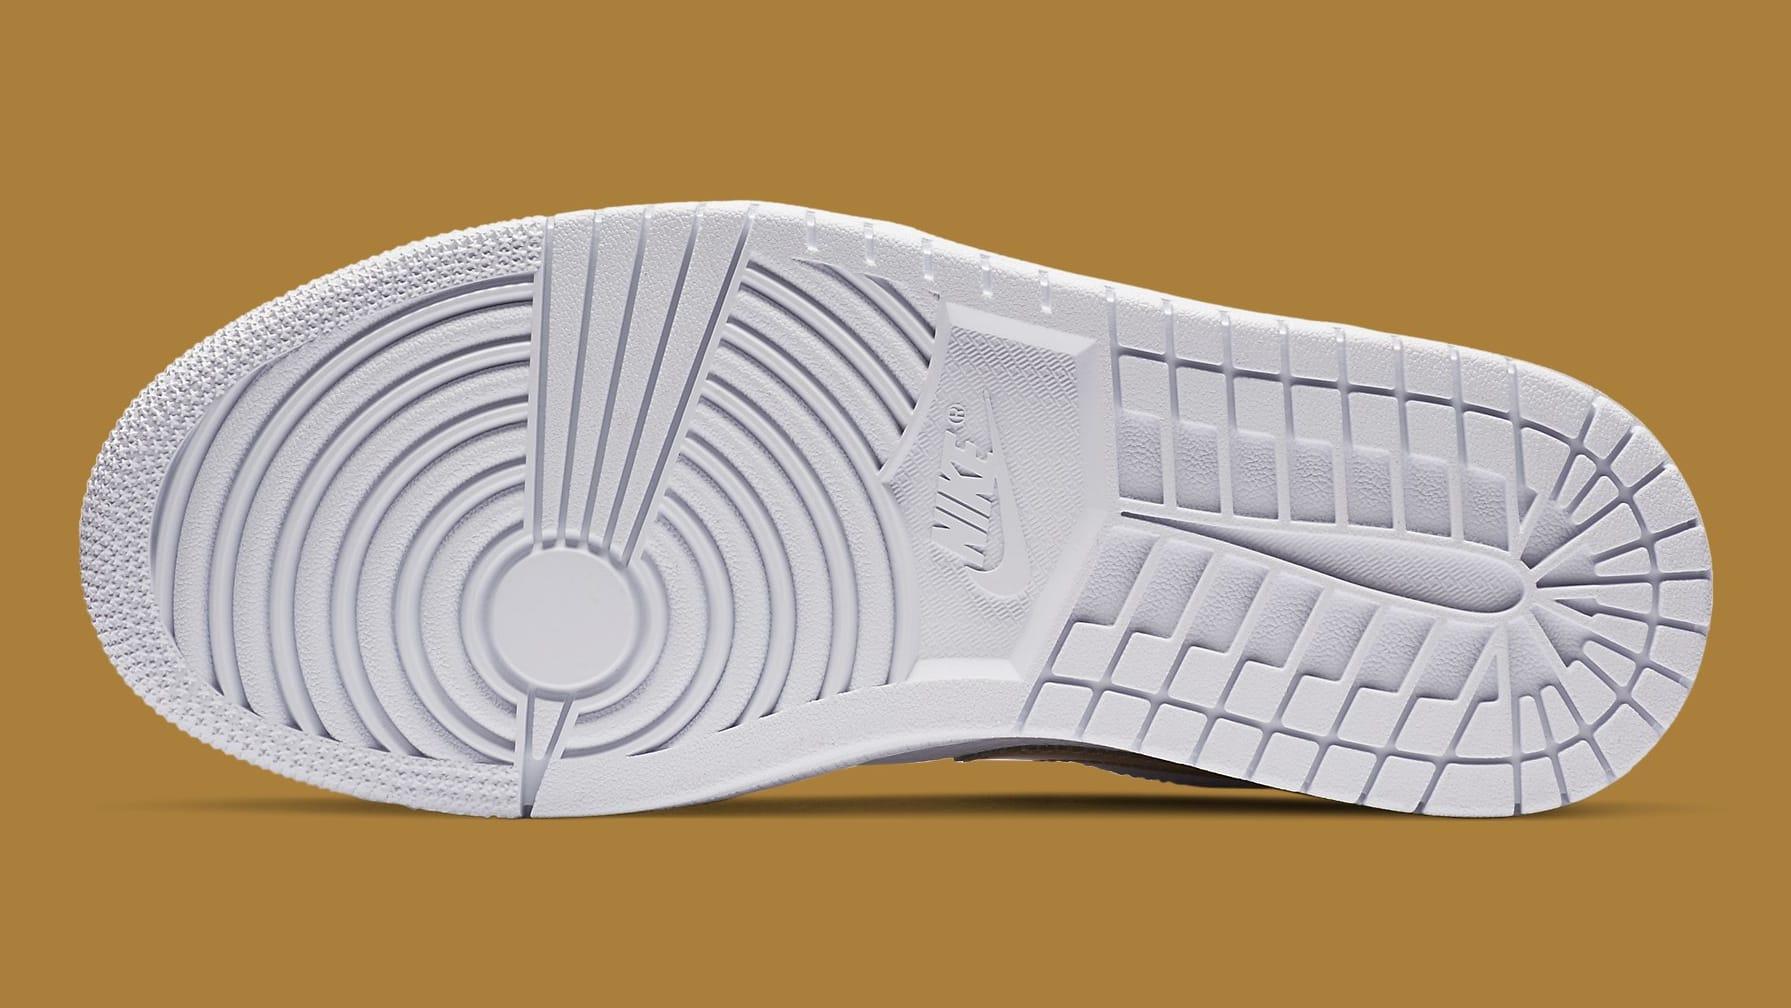 Air Jordan 1 Low White Metallic Gold Release Date CZ4776-100 Sole